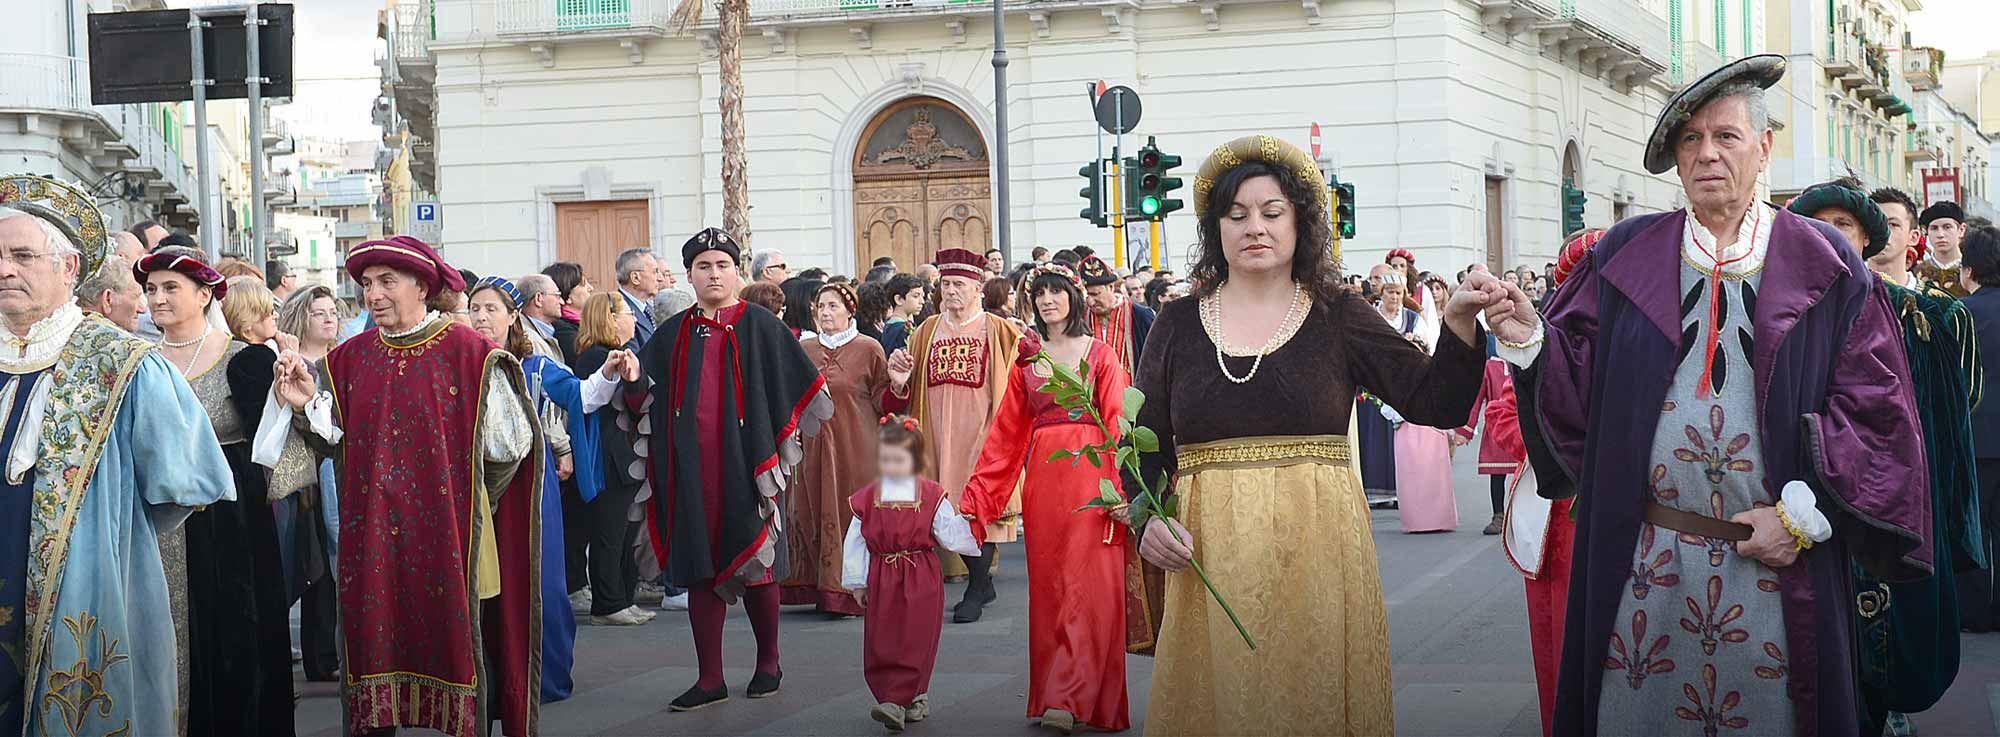 Bitonto: Corteo storico